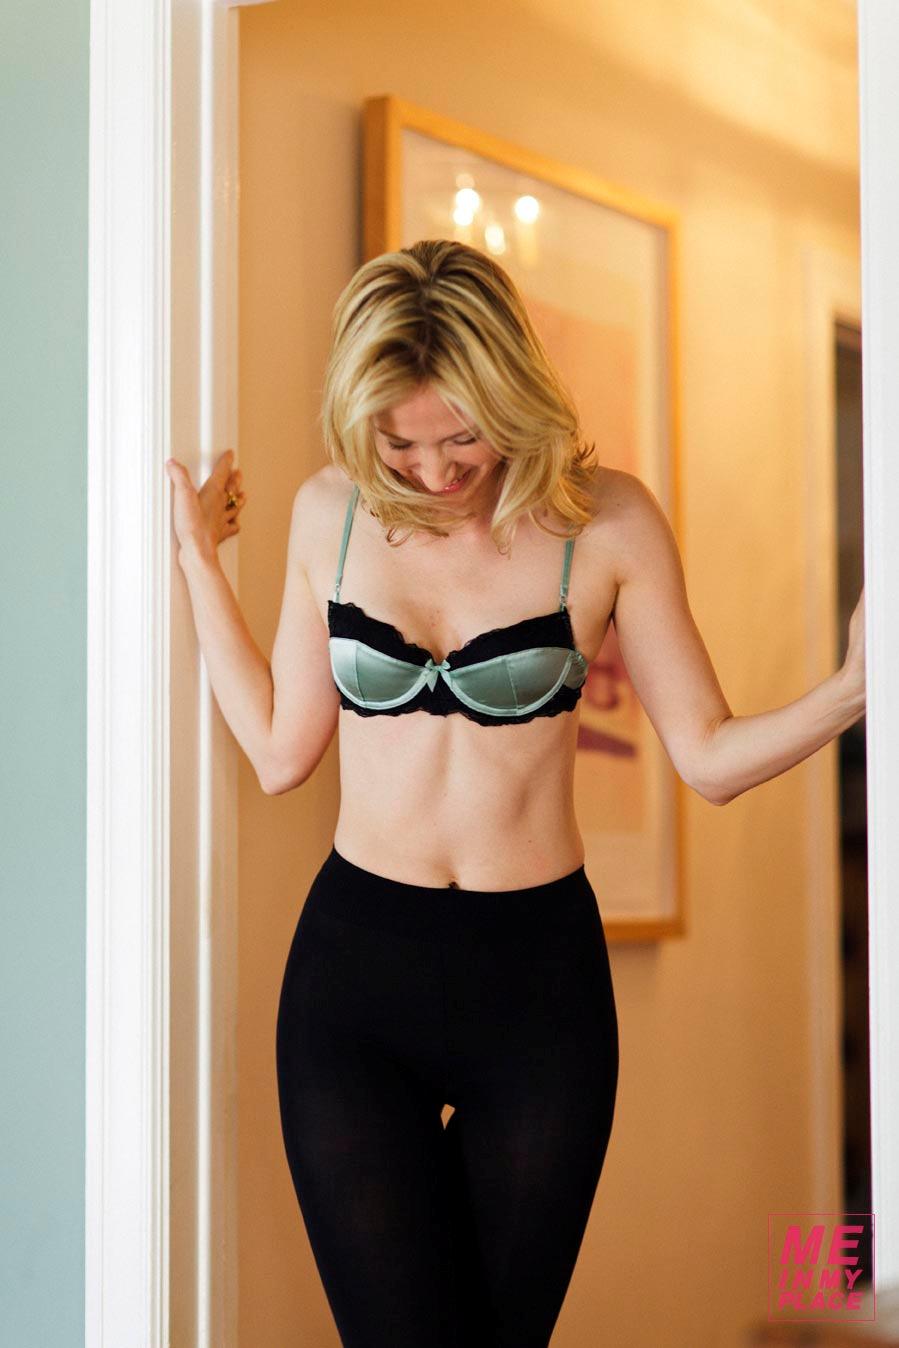 Gallery Bikini Beth Riesgraf  naked (61 photo), Instagram, legs